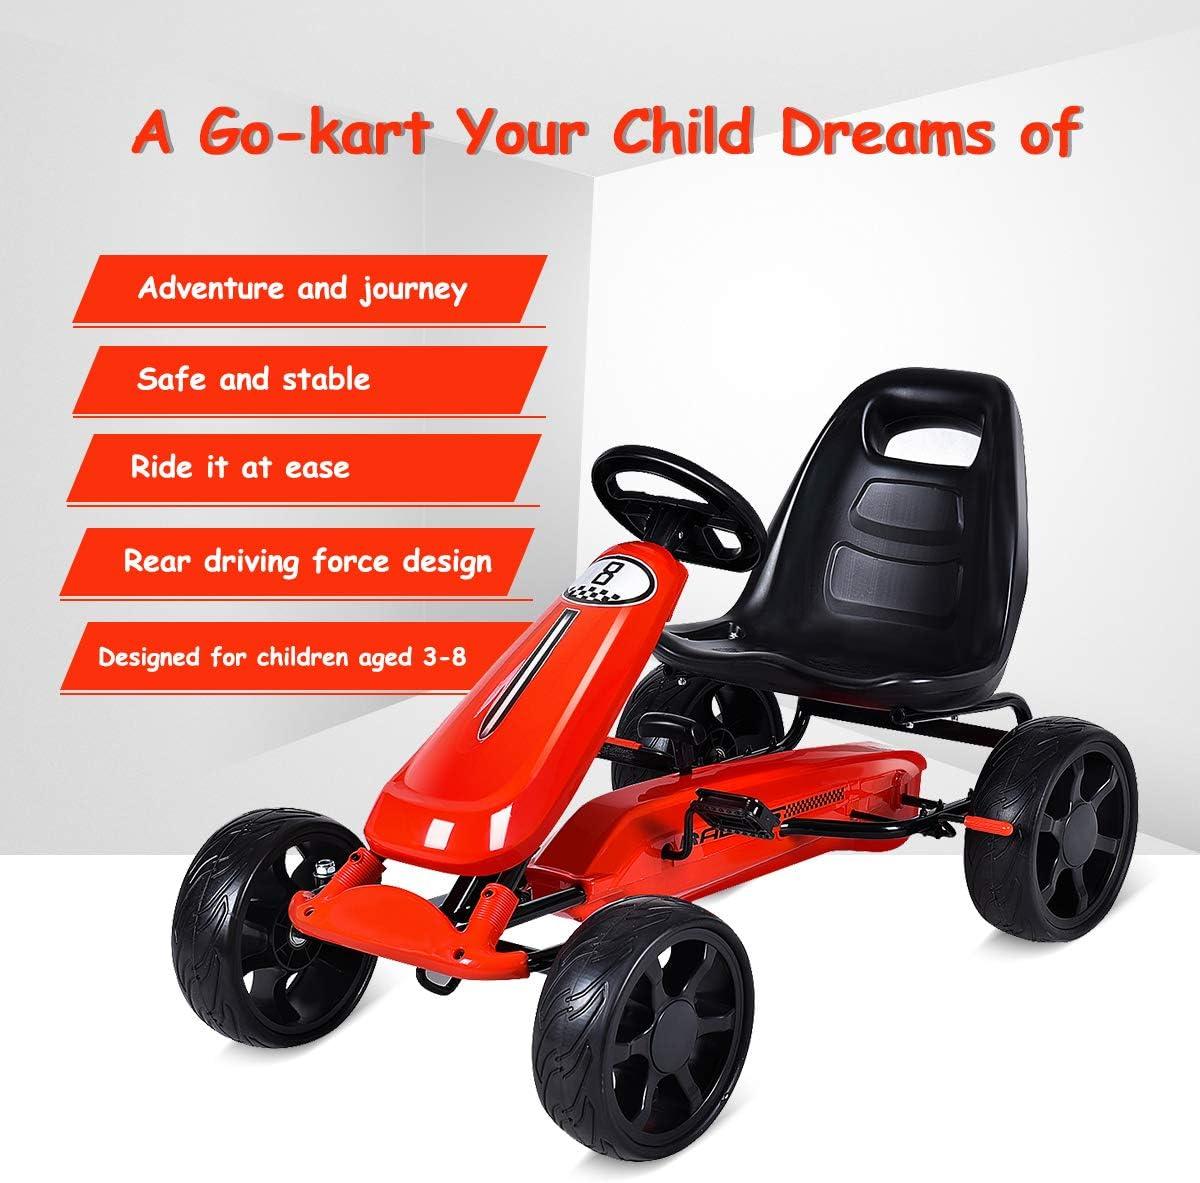 HONEY JOY Pedal Go Kart for Kids 4-Wheels Quad Ride On Car w// 2-Position Adjustable Seat EVA Rubber Wheels Outdoor Racer Pedal Vehicle for Baby Boys Girls Handbrake /& Clutch Red